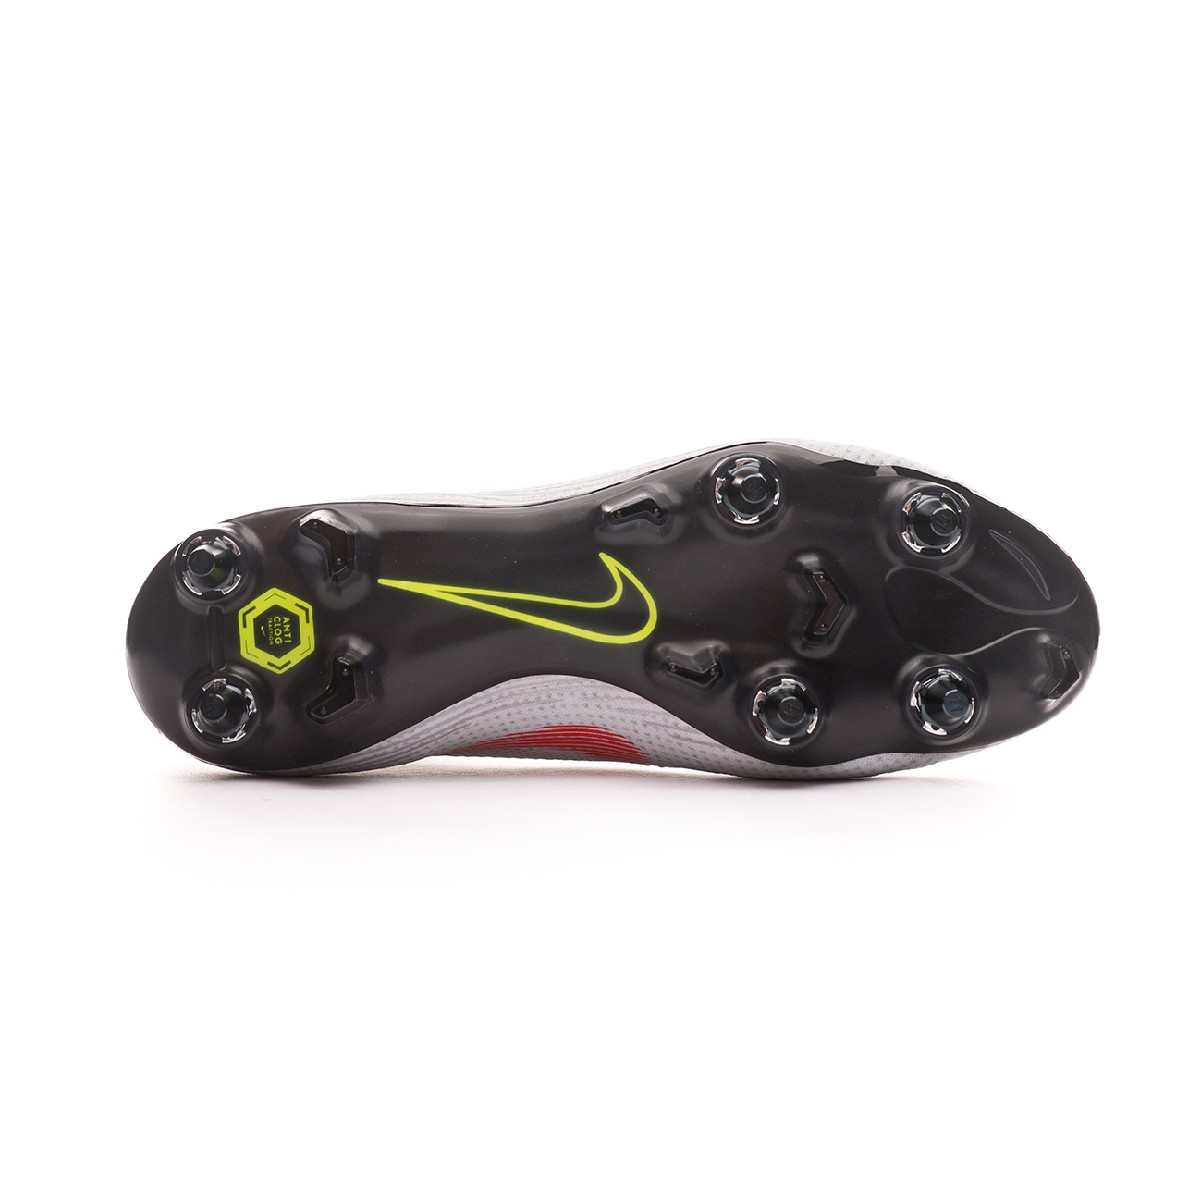 7f4fa496d Football Boots Nike Mercurial Superfly VI Elite Anti-Clog SG-Pro Wolf grey-Light  crimson-Pure platinum - Tienda de fútbol Fútbol Emotion